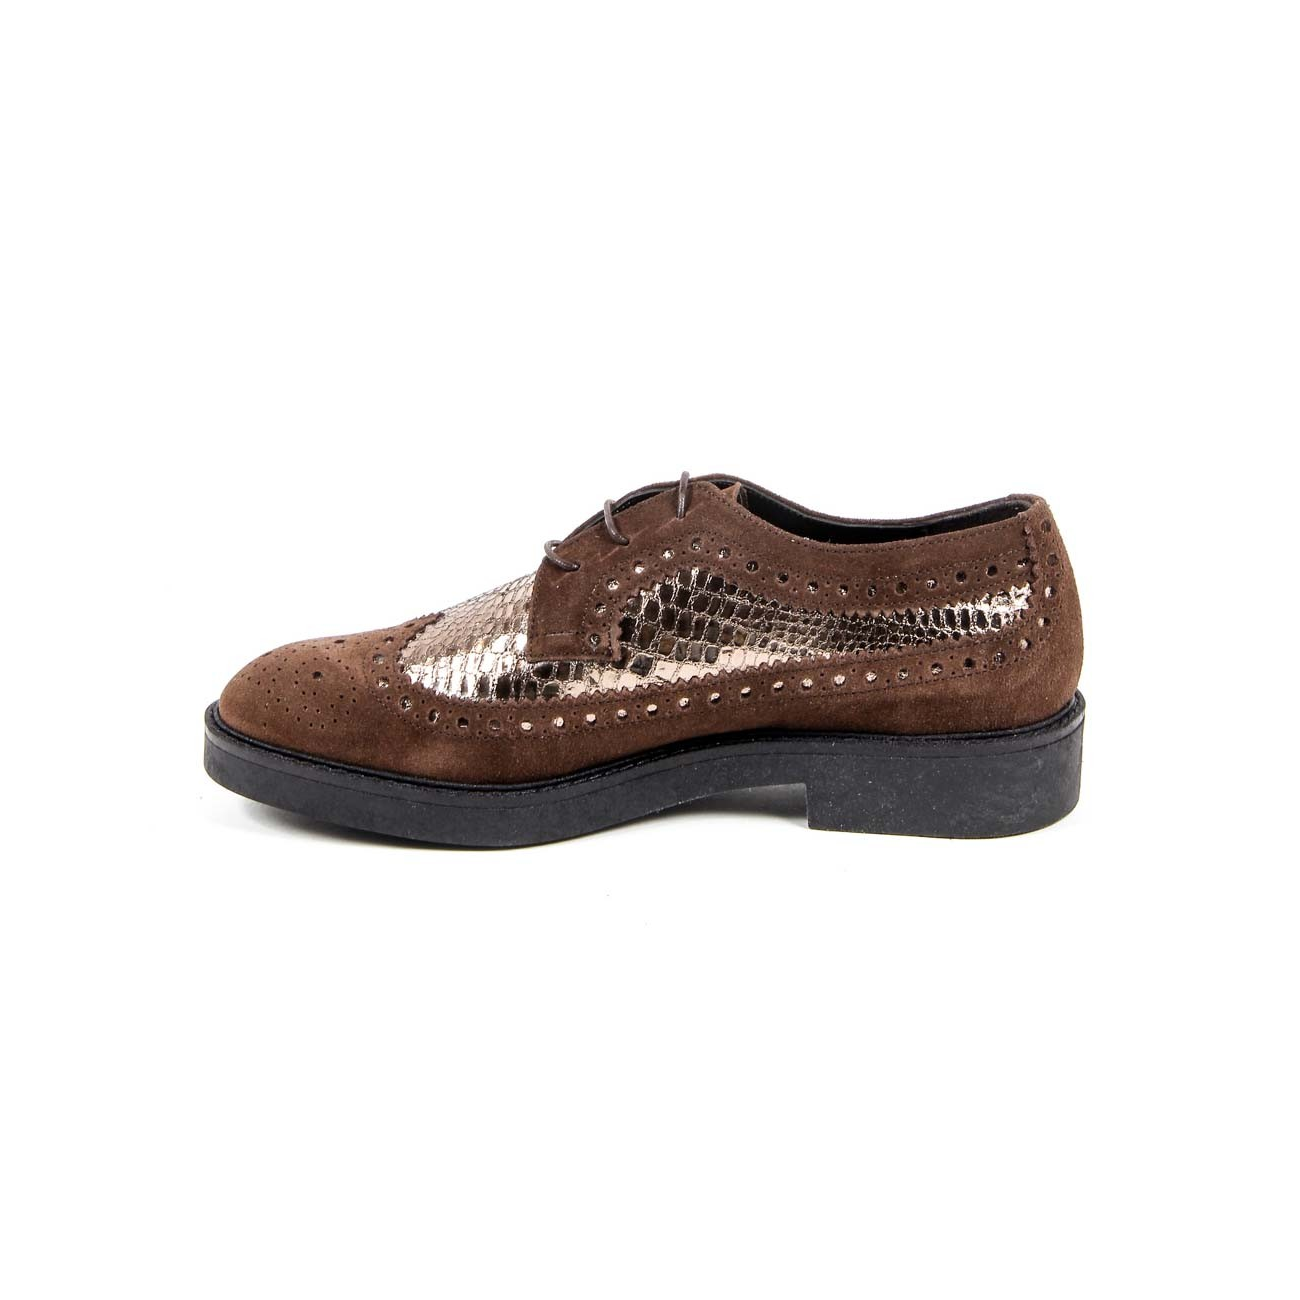 V 1969 Italia Women's Brogue Shoe B1670 VELOUR + PIETRA T. MORO